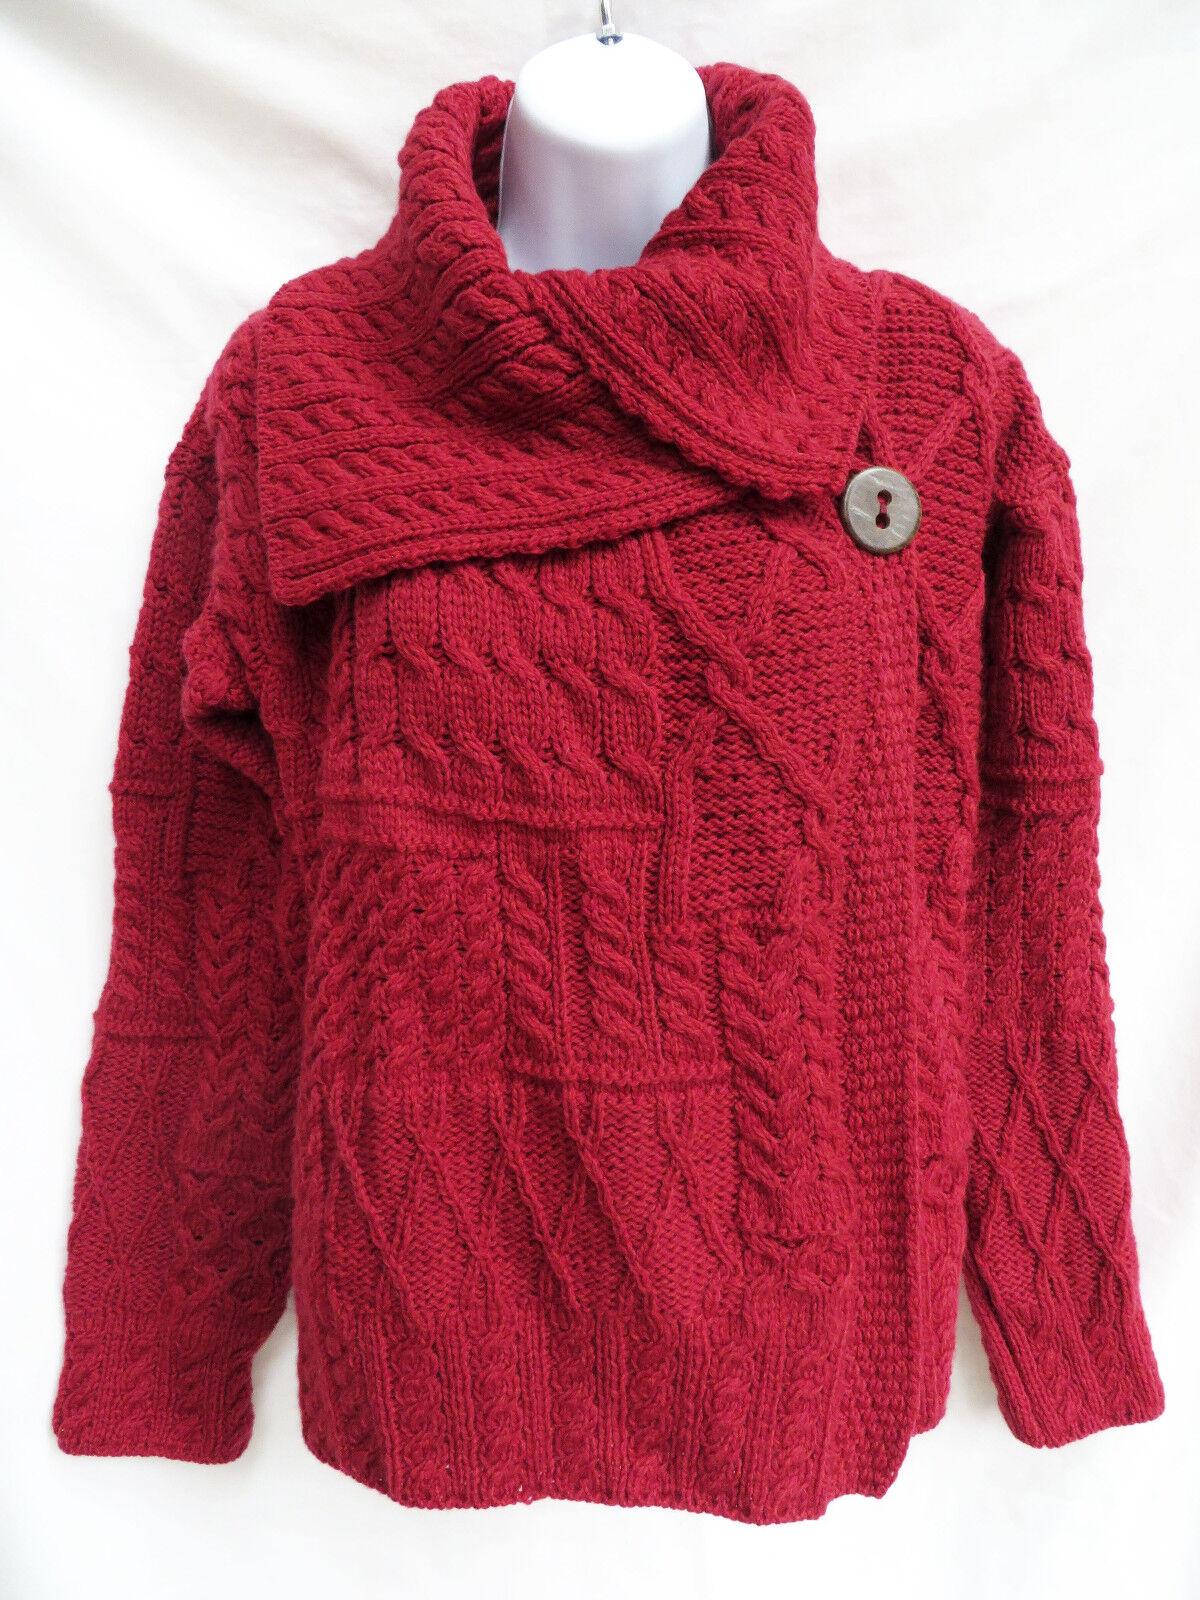 CARRAIG DONN Womens Red Corina Fisherman CableKnit Wool Cardigan Sweater Coat S